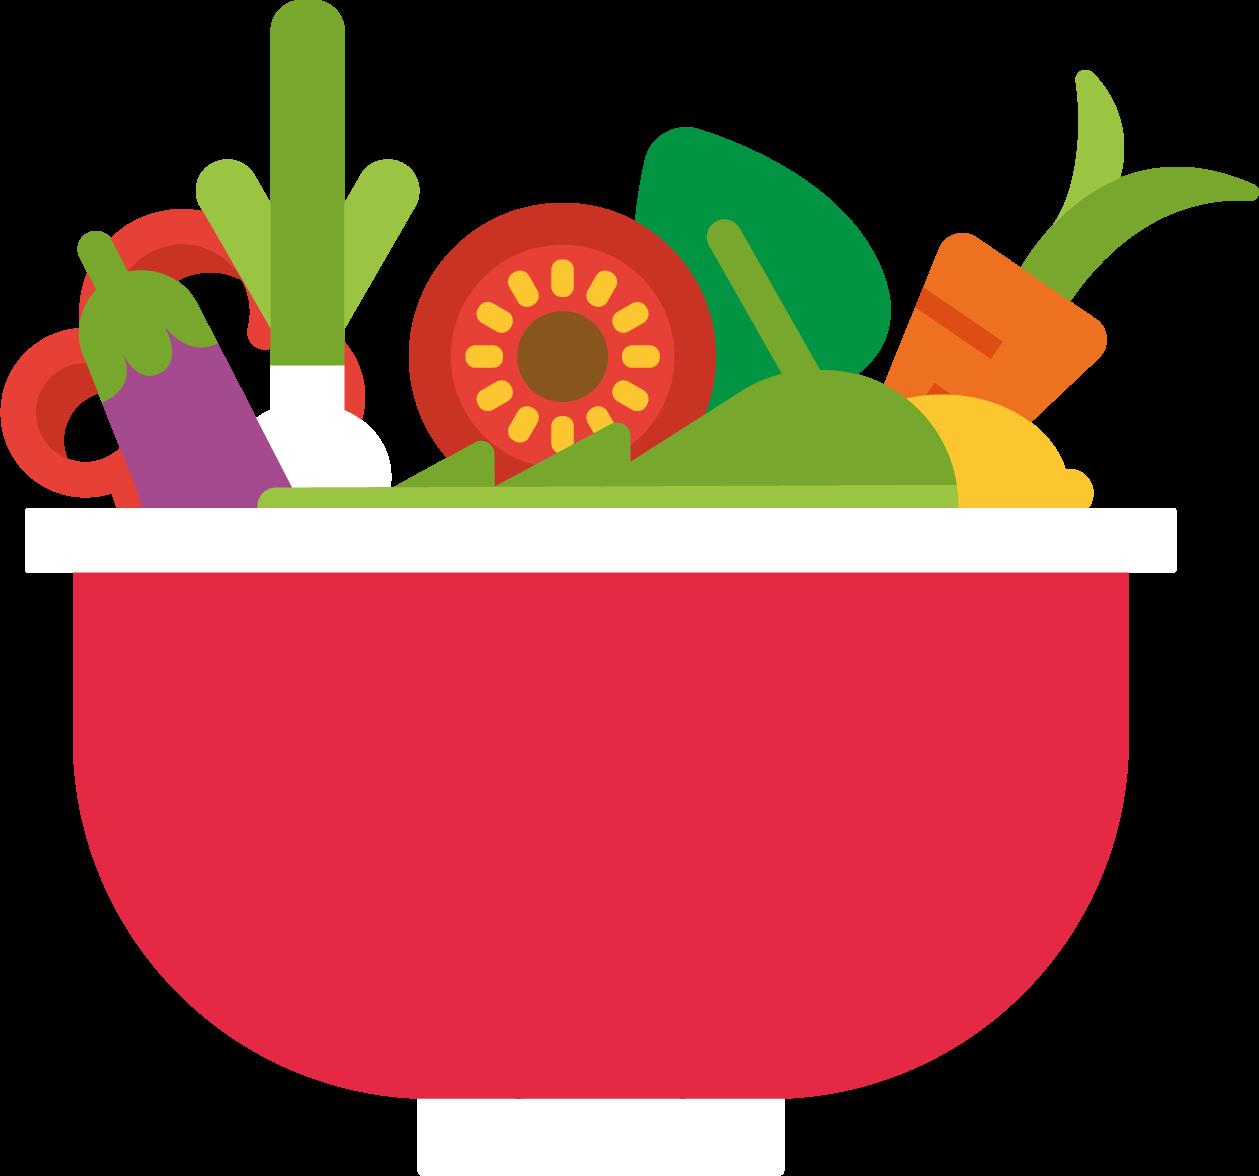 Salad PNG Transparent Free Images